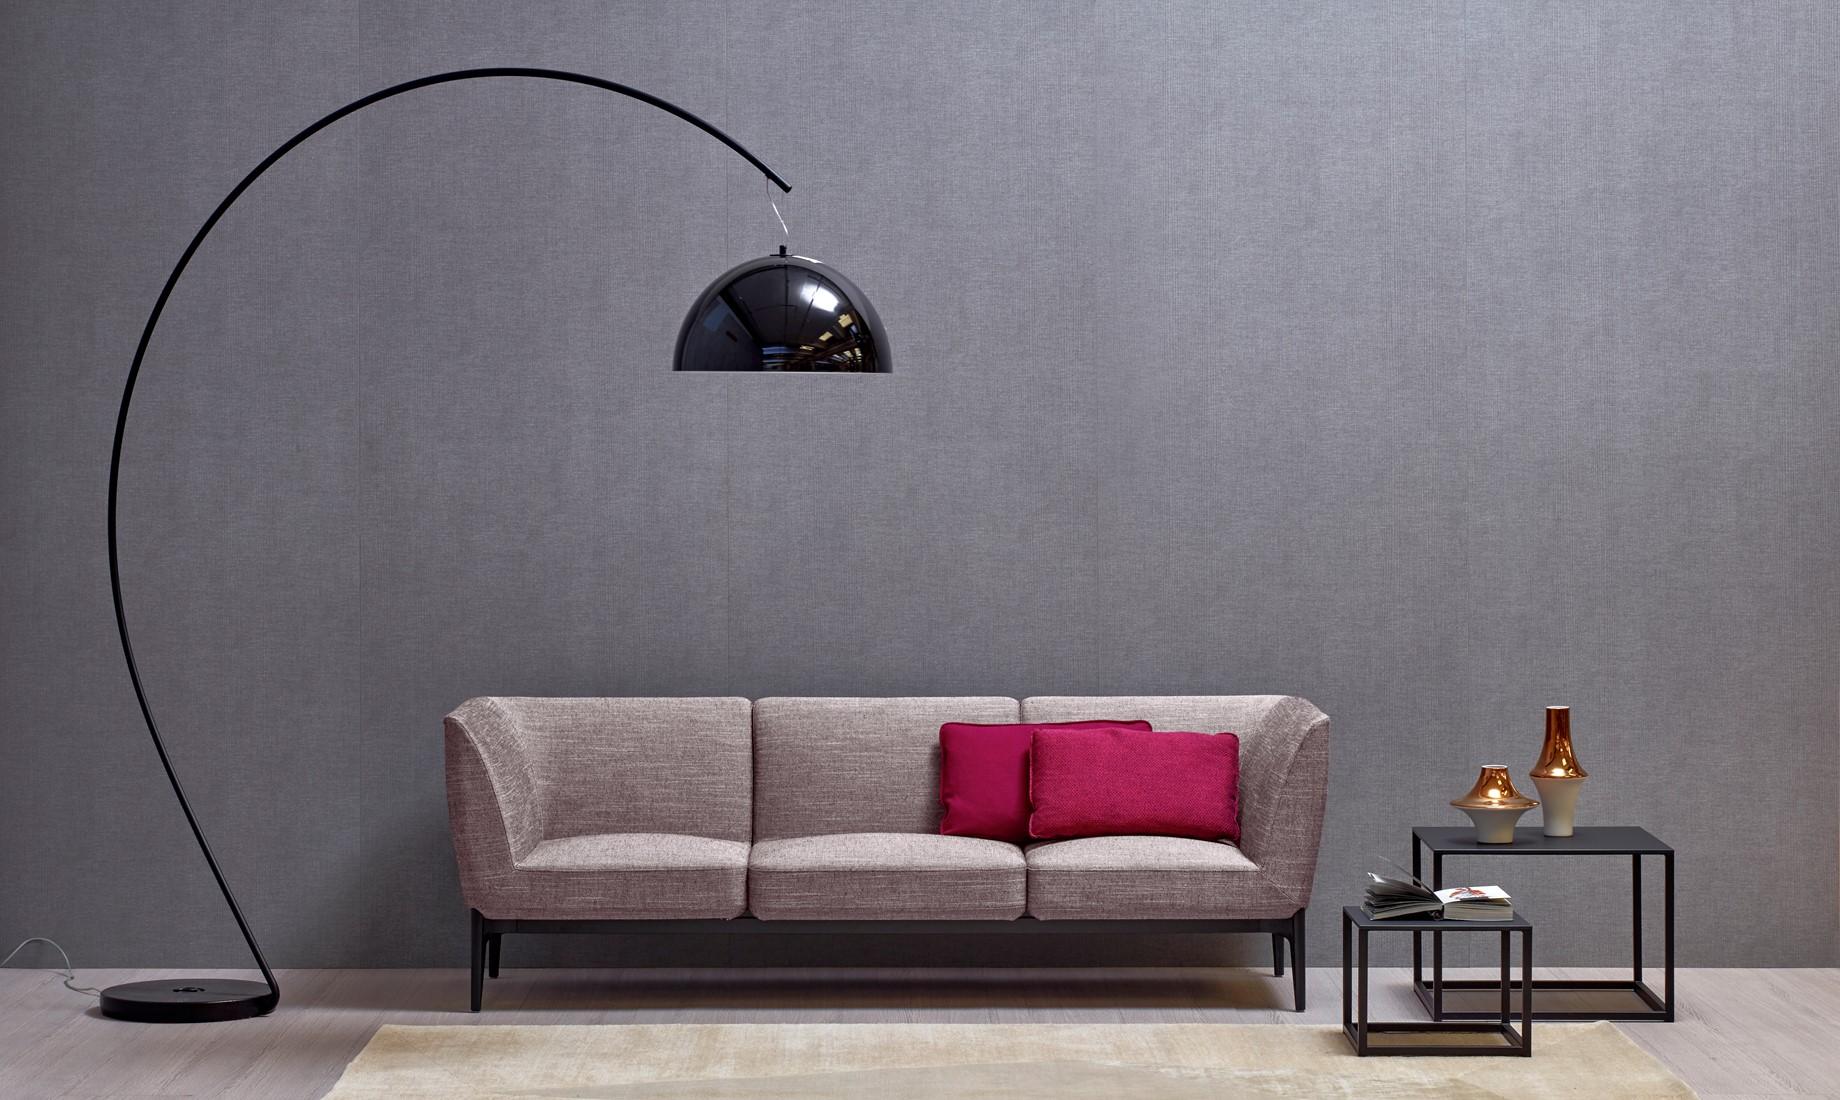 Fabulous Staande Lamp Ikea Goud: Rickarum tafellamp zilverkleur ikea #SX24